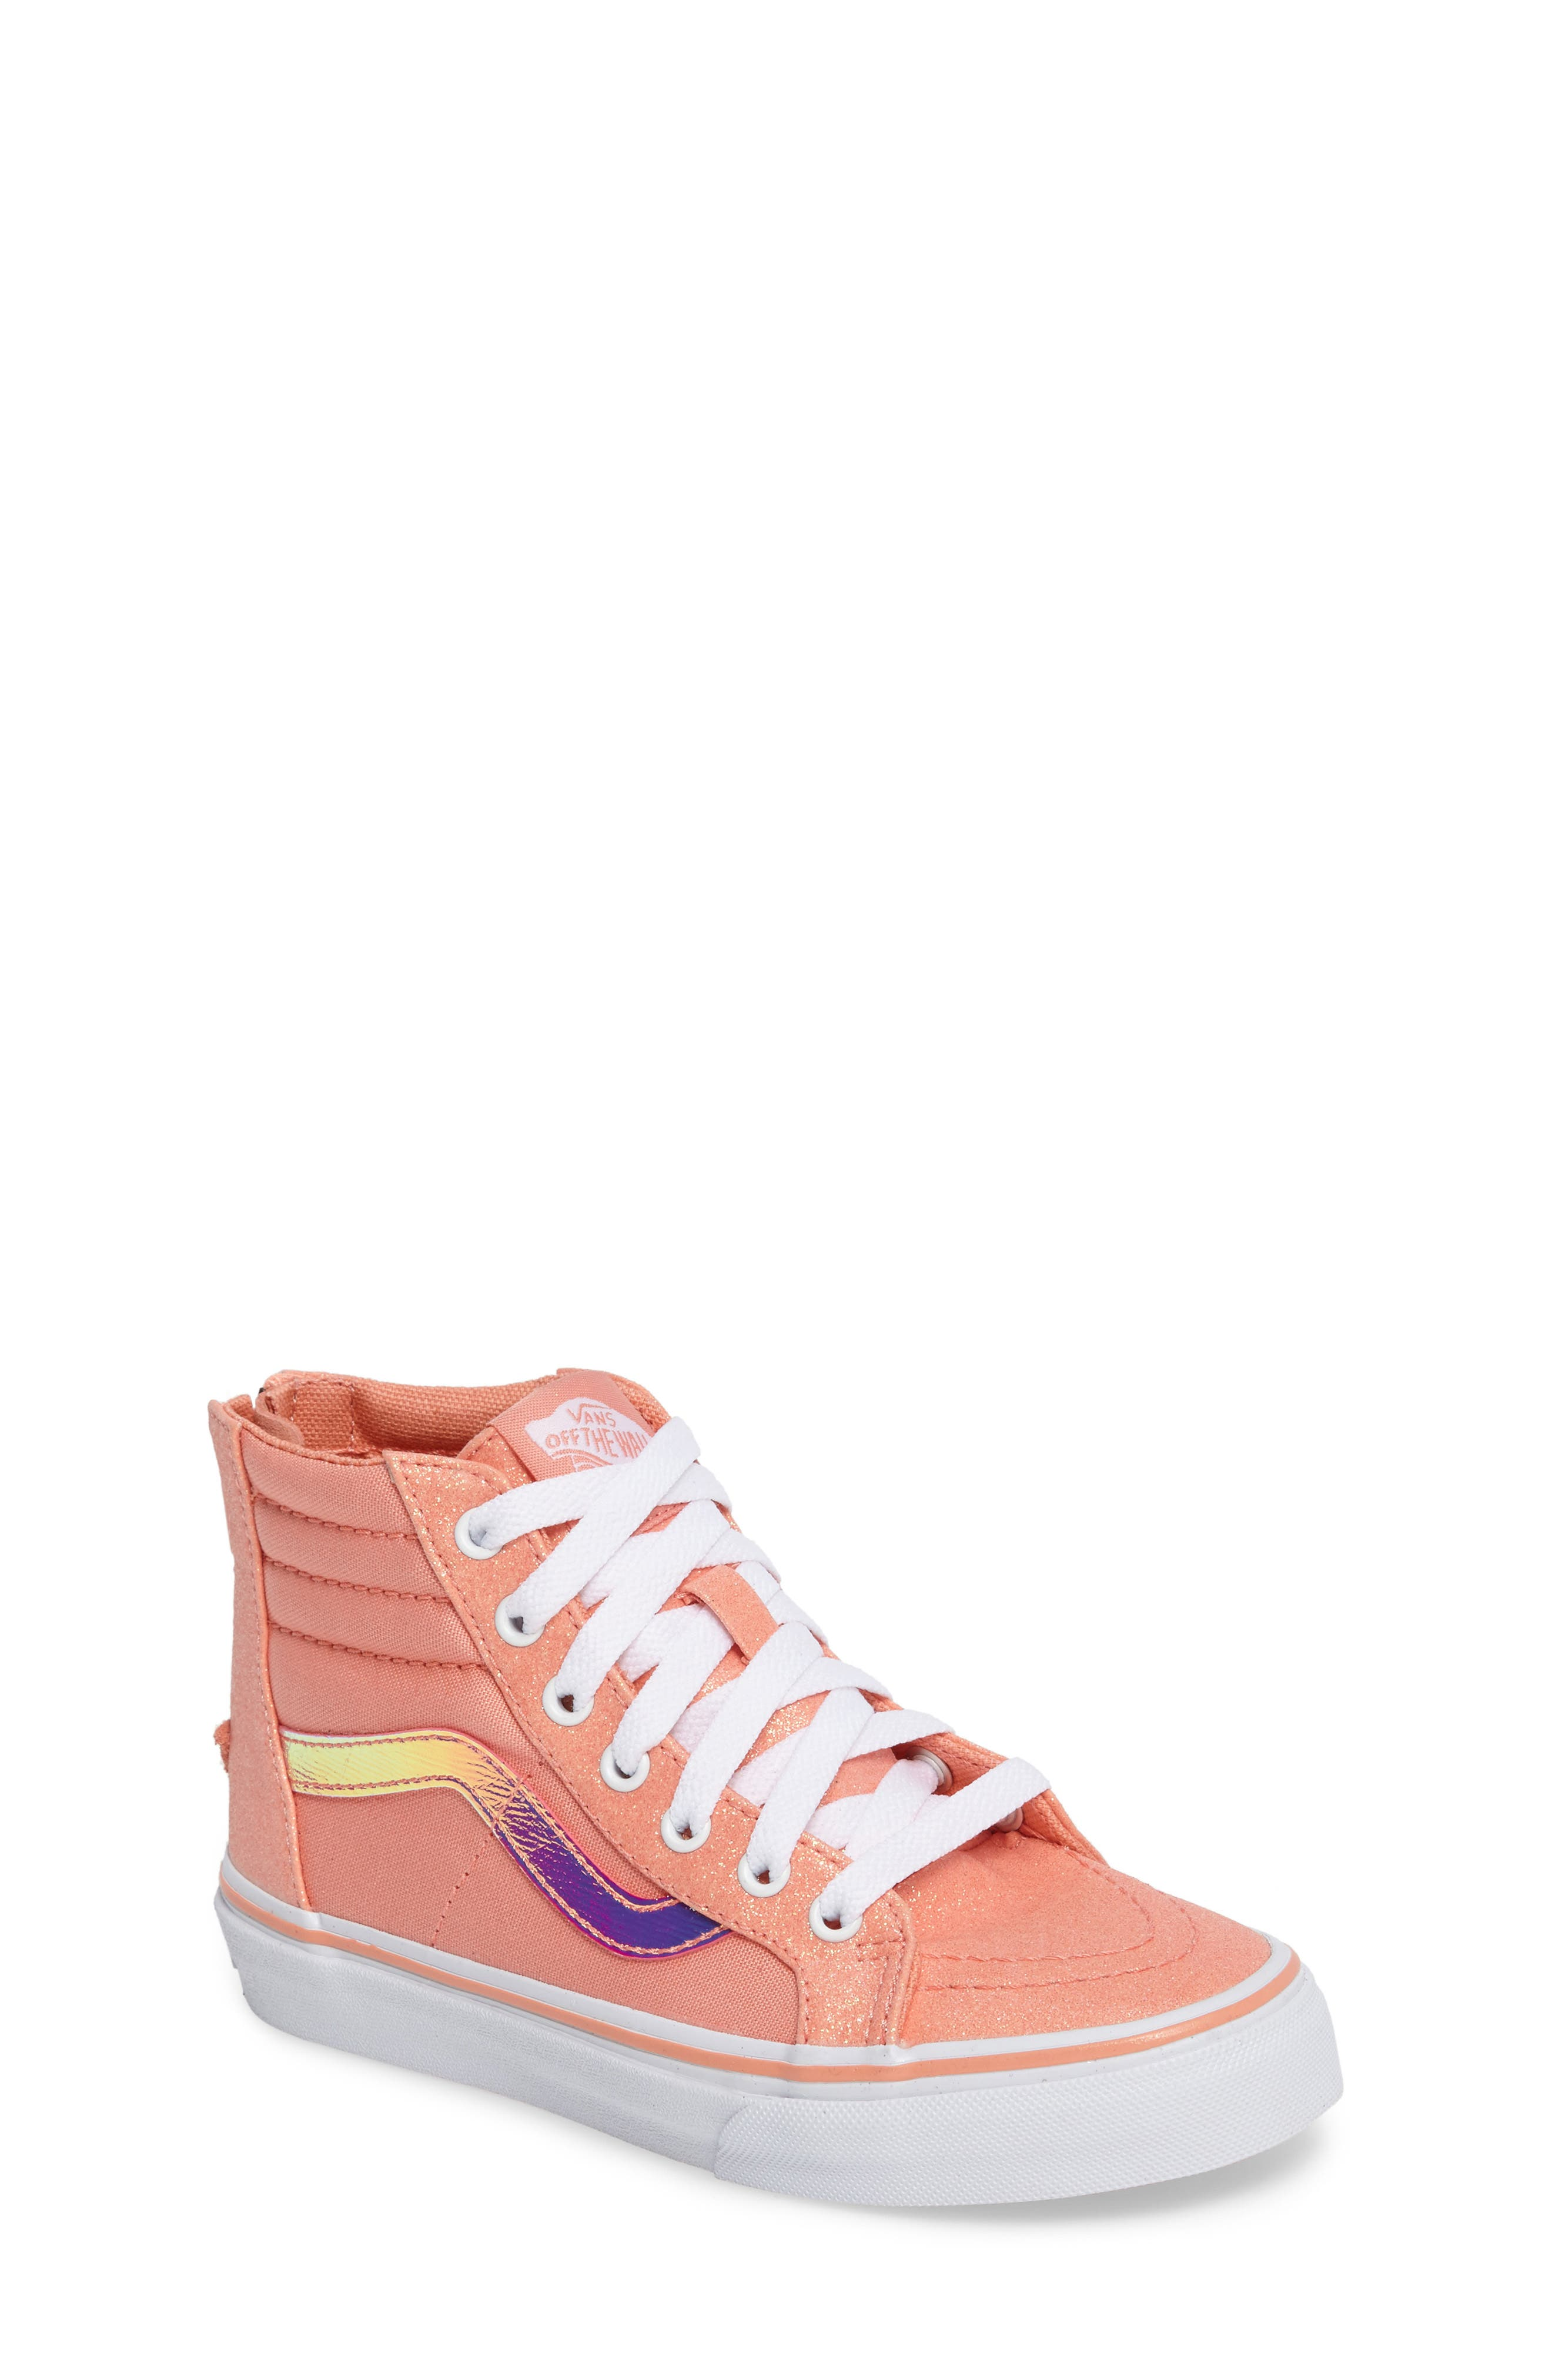 Sk8-Hi Zip Sneaker,                             Main thumbnail 1, color,                             Coral Glitter/ Iridescent